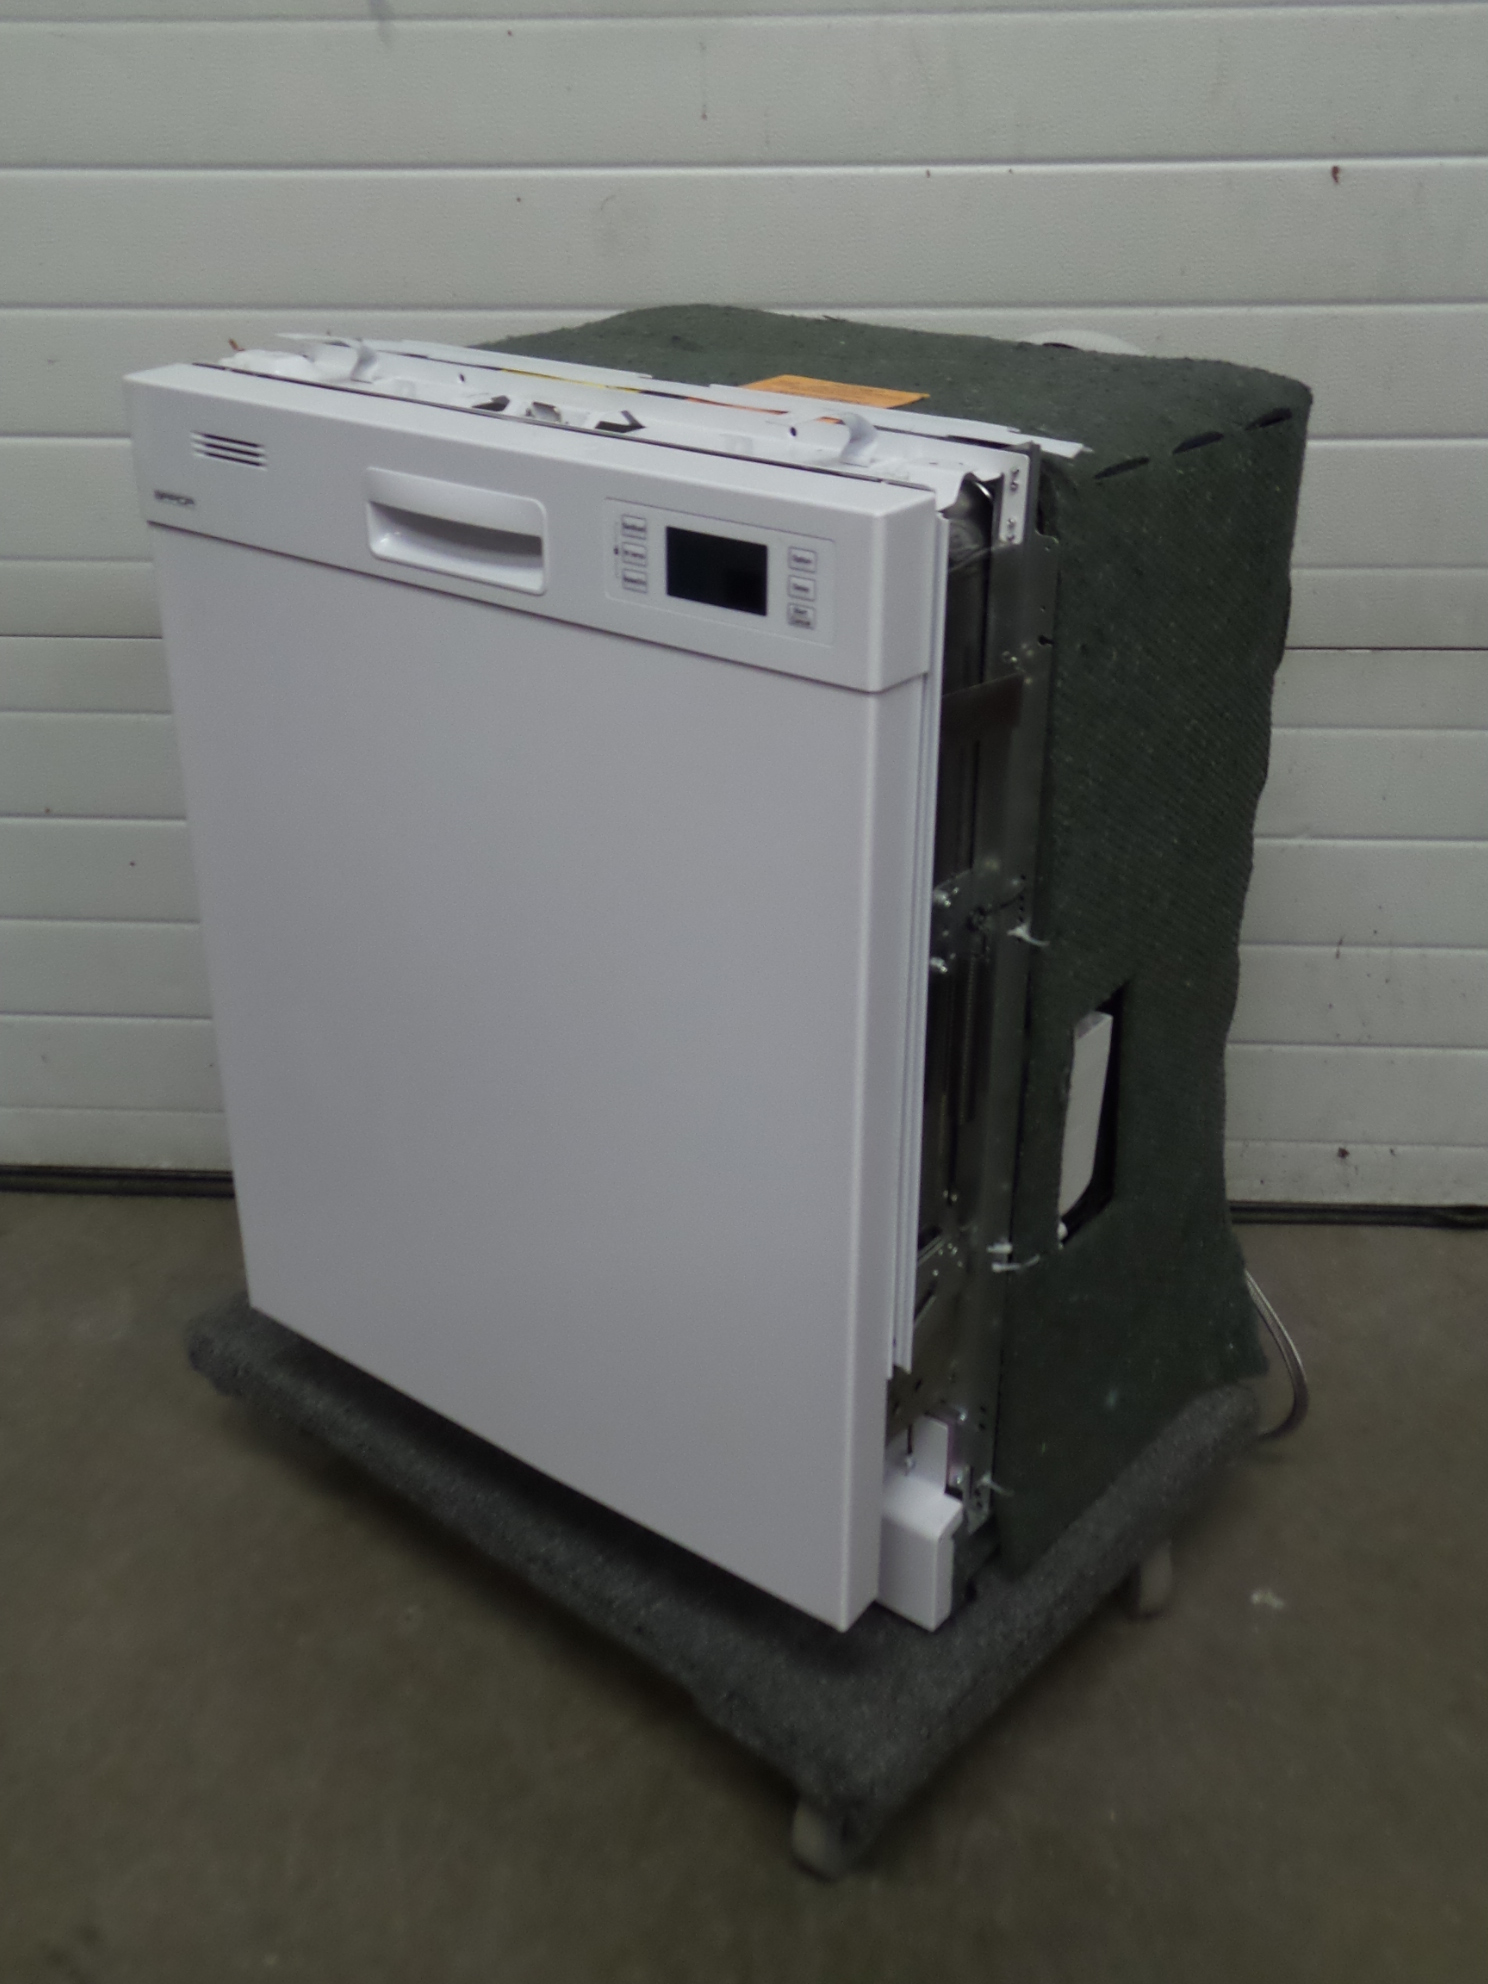 Brada EBS9373HW Under Counter Dishwasher w Stainless